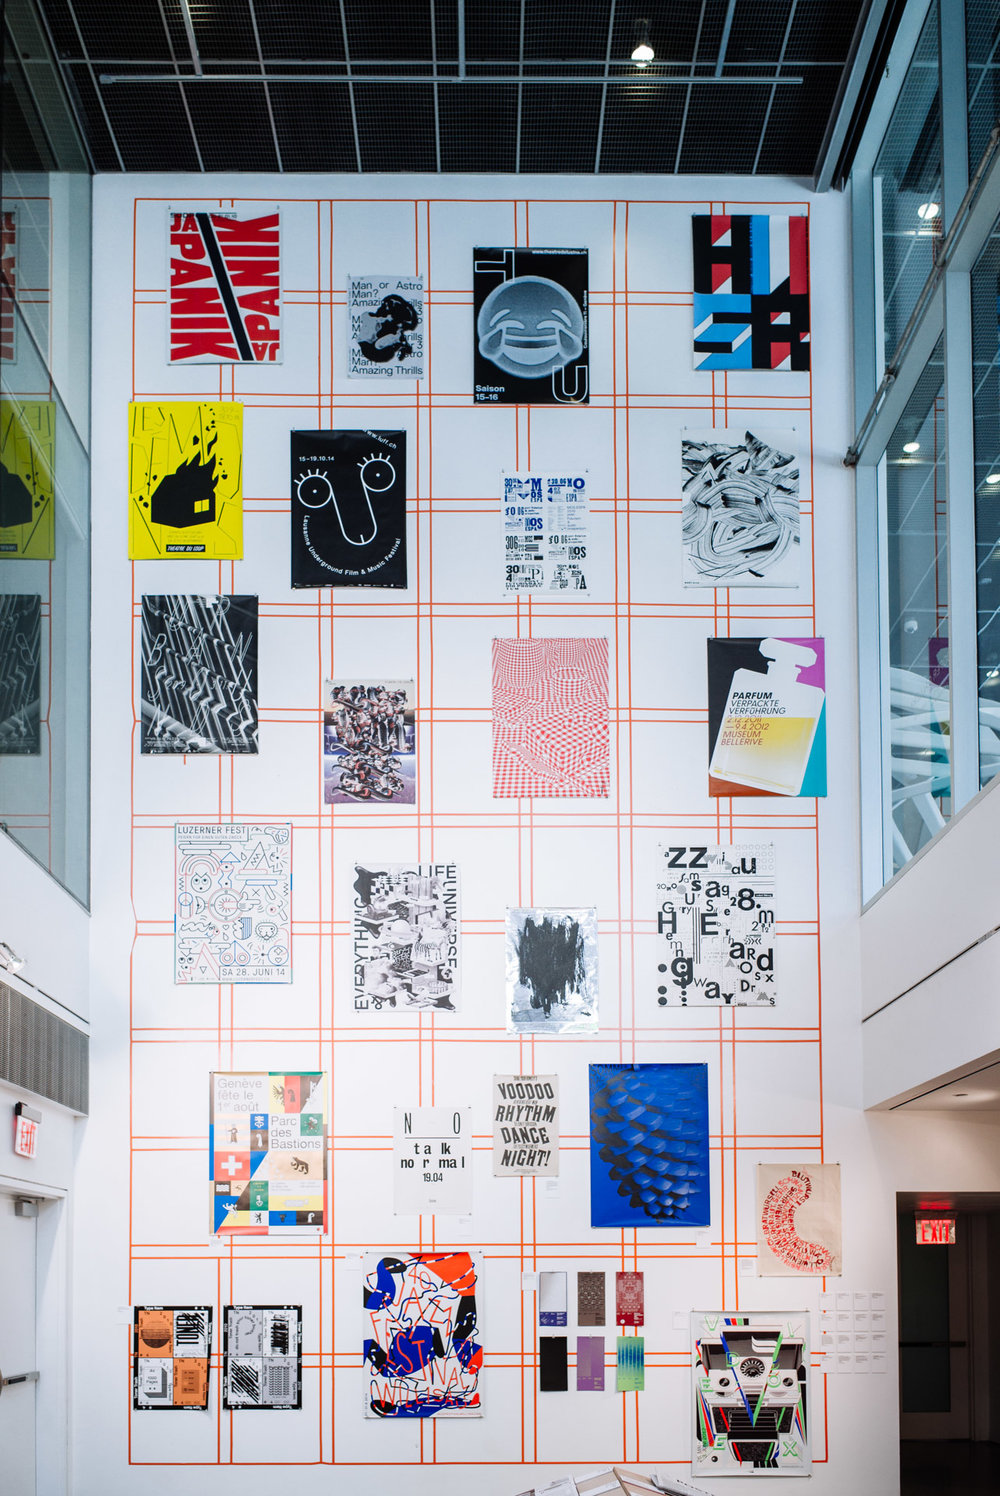 Swiss Design exhibit at Lubalin Center in Cooper Union.